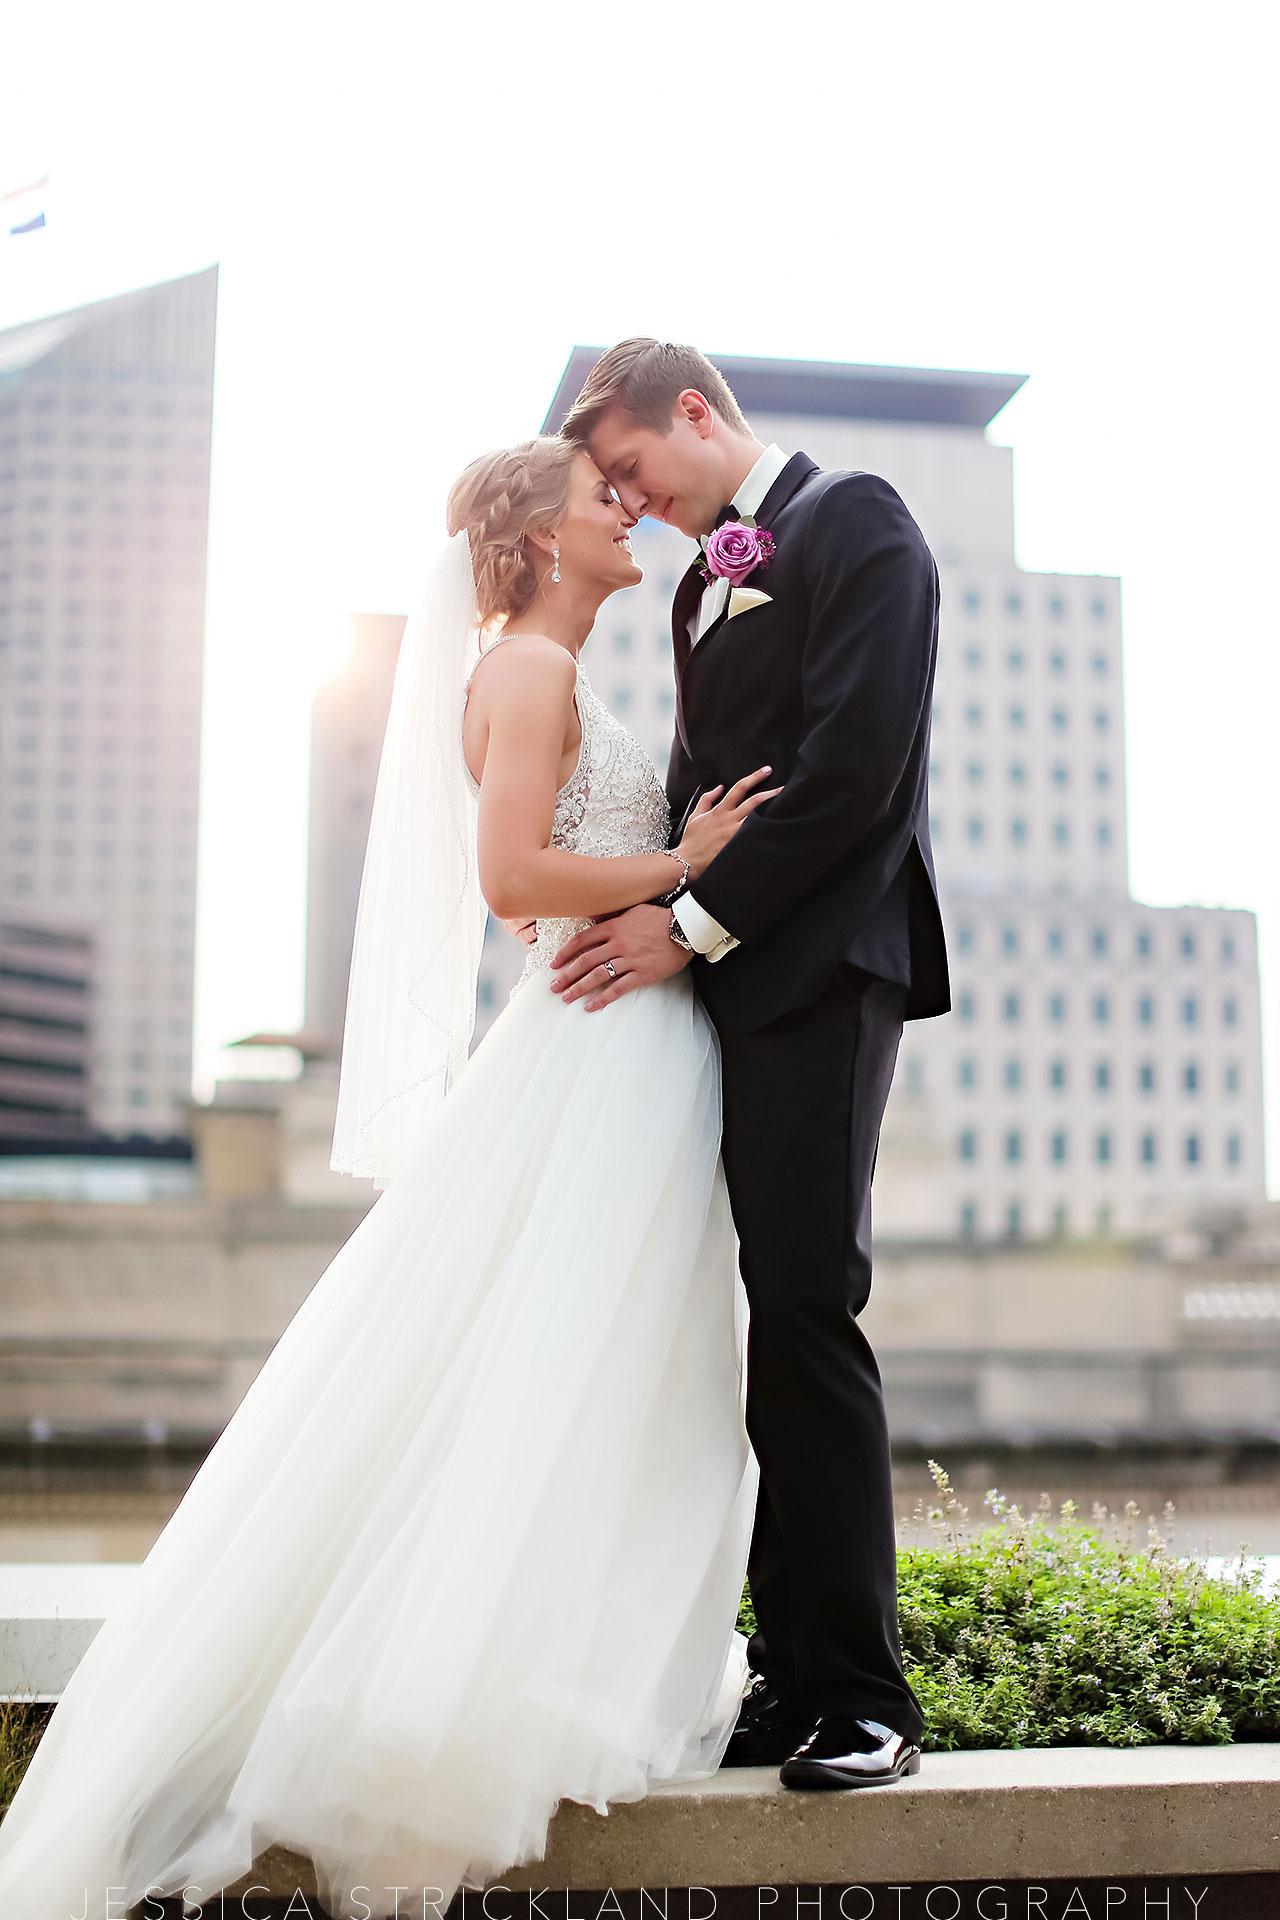 Serra Alex Regions Tower Indianapolis Wedding 226 watermarked